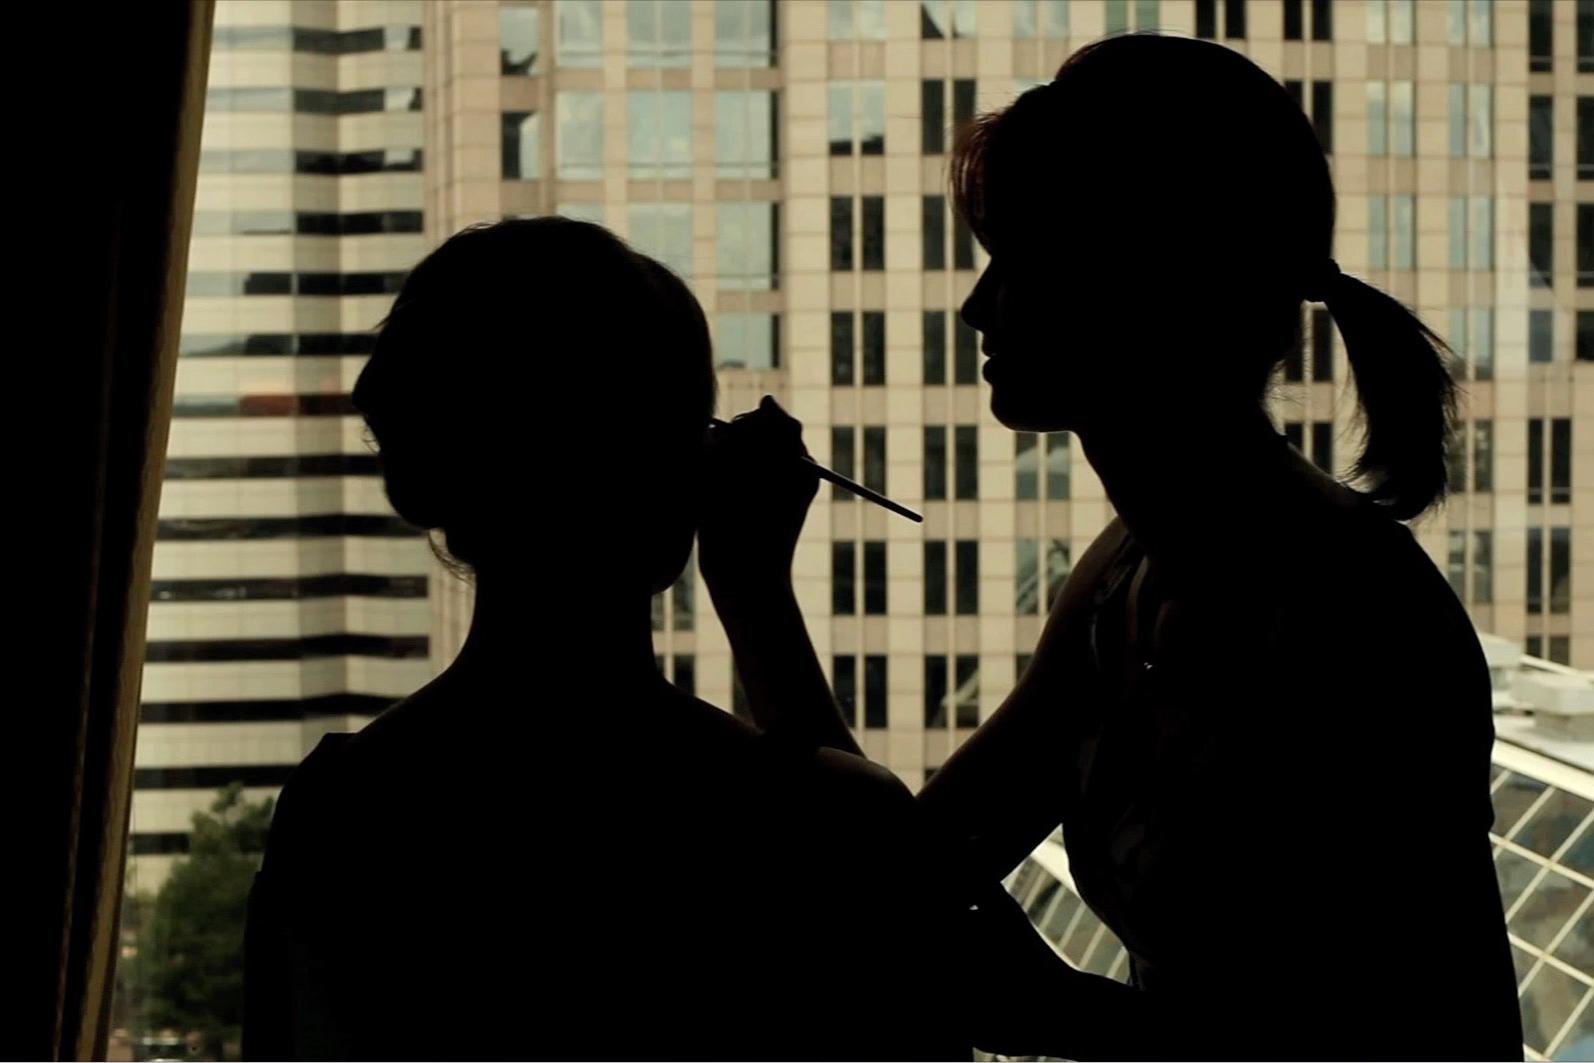 makeup silhouette charlotte city ckyline